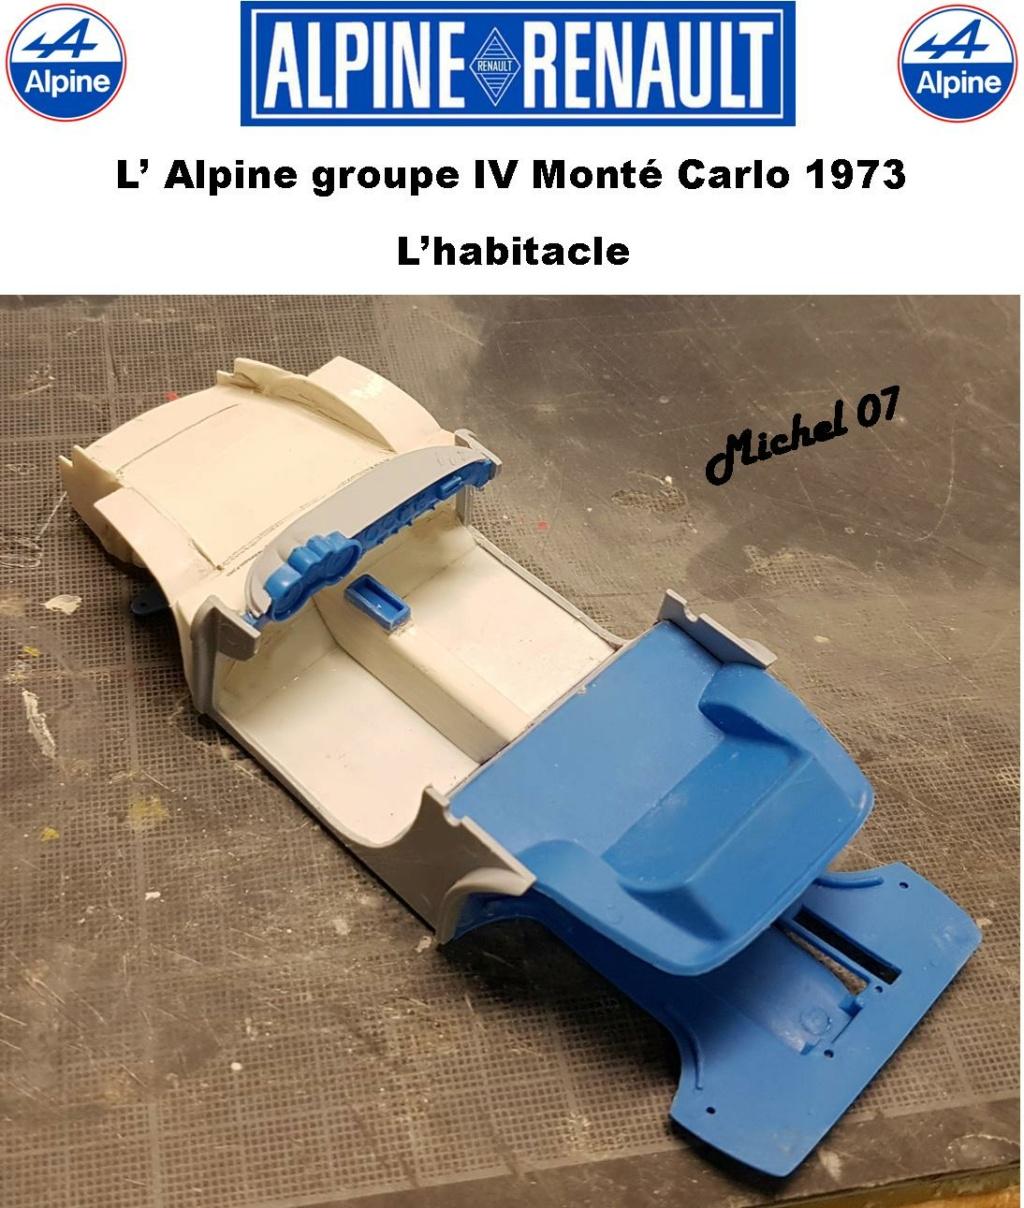 Fil rouge 2021 * Alpine A110 Groupe IV Monté Carlo 1973 1/24 Heller 80745 diorama assistance 20_210